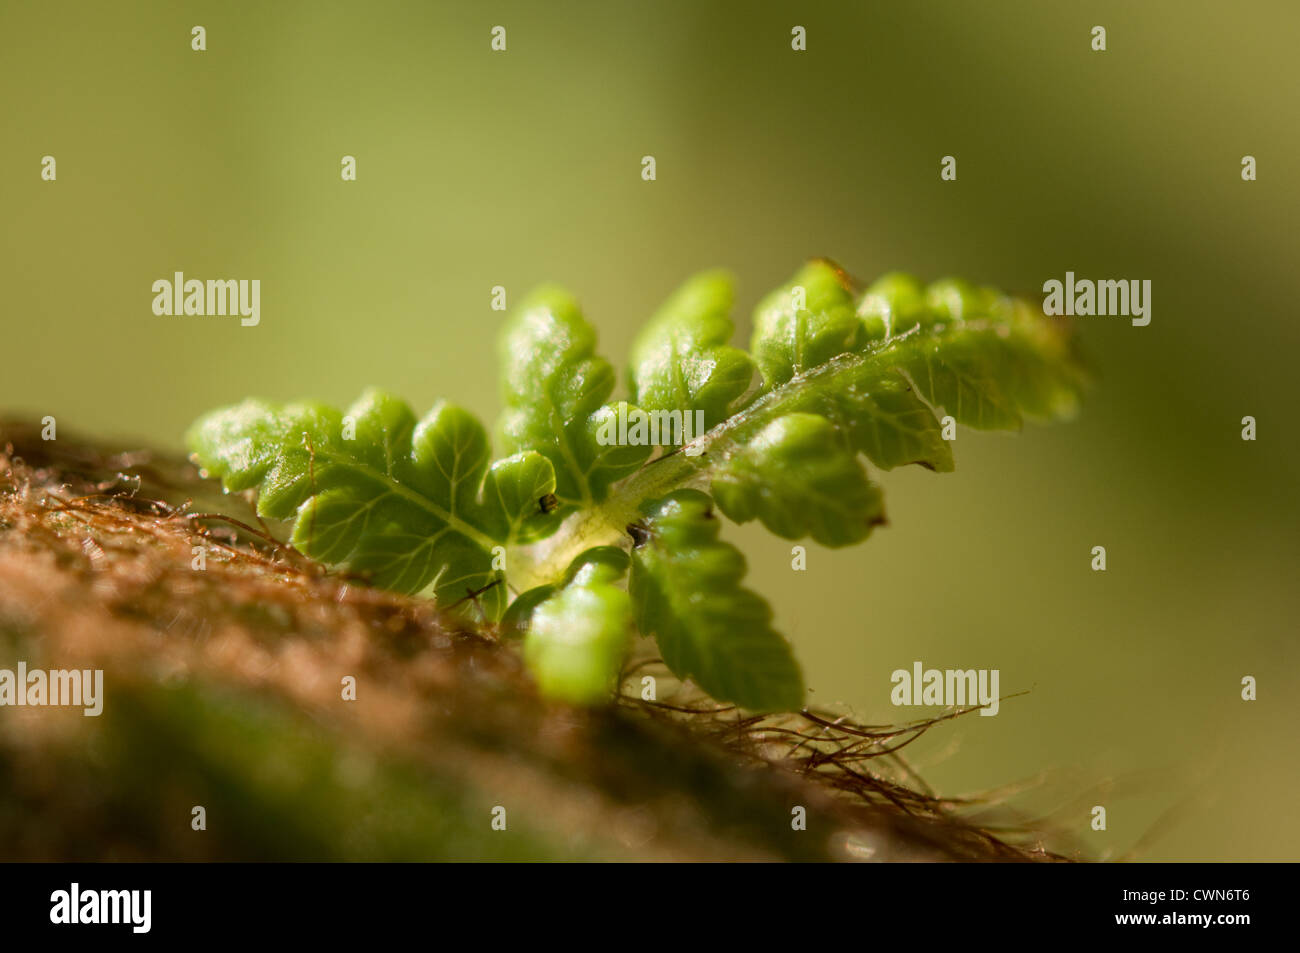 Dicksonia antartica, Fern, Tree fern - Stock Image